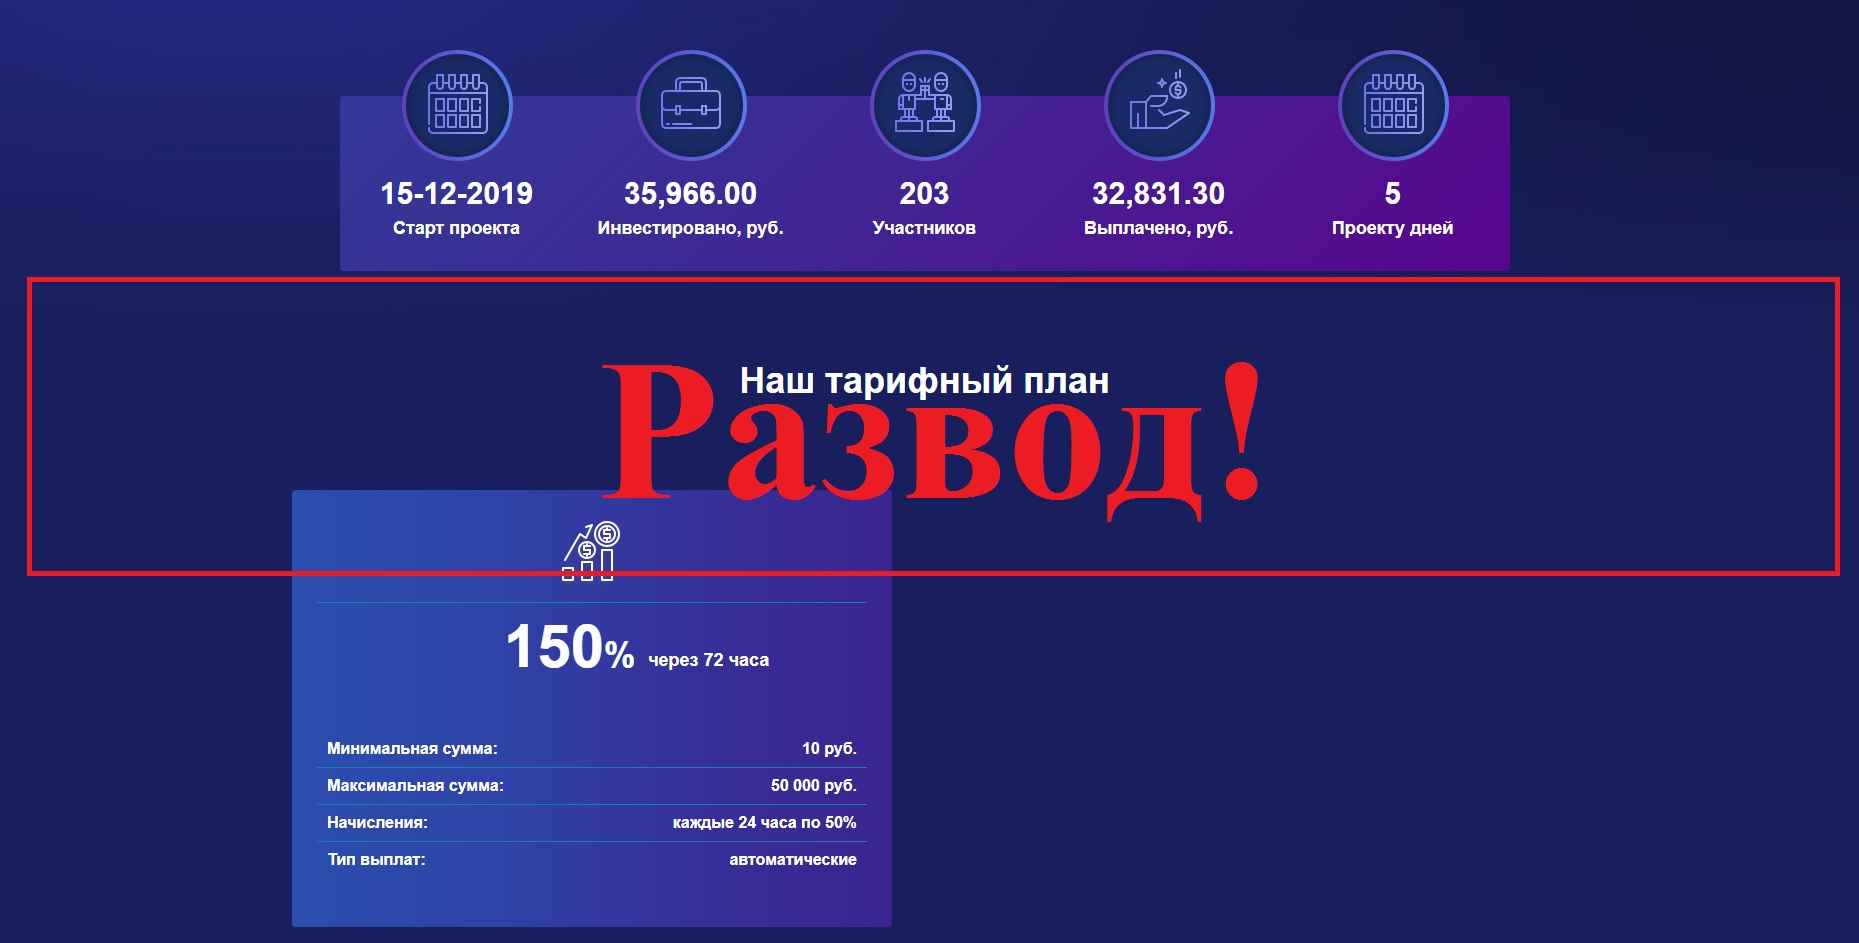 We-ProfessionalTeam.Club – алгоритм дохода для увеличения капитала. Обман?